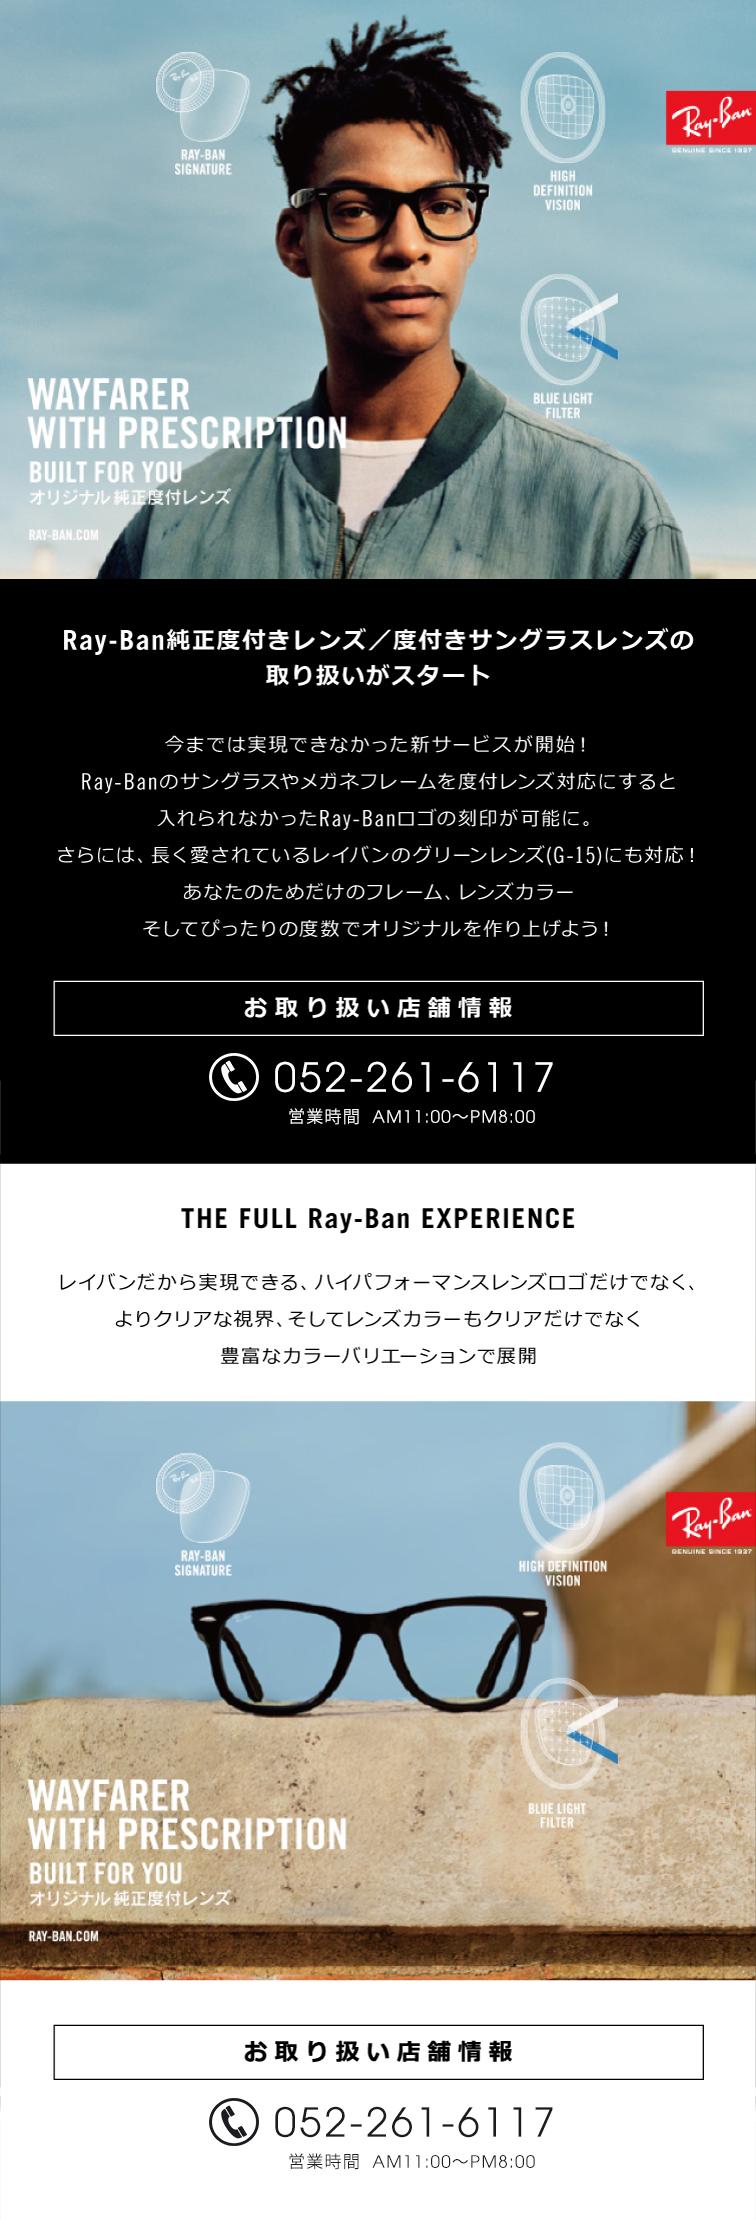 Ray-Ban_Lens-EDM